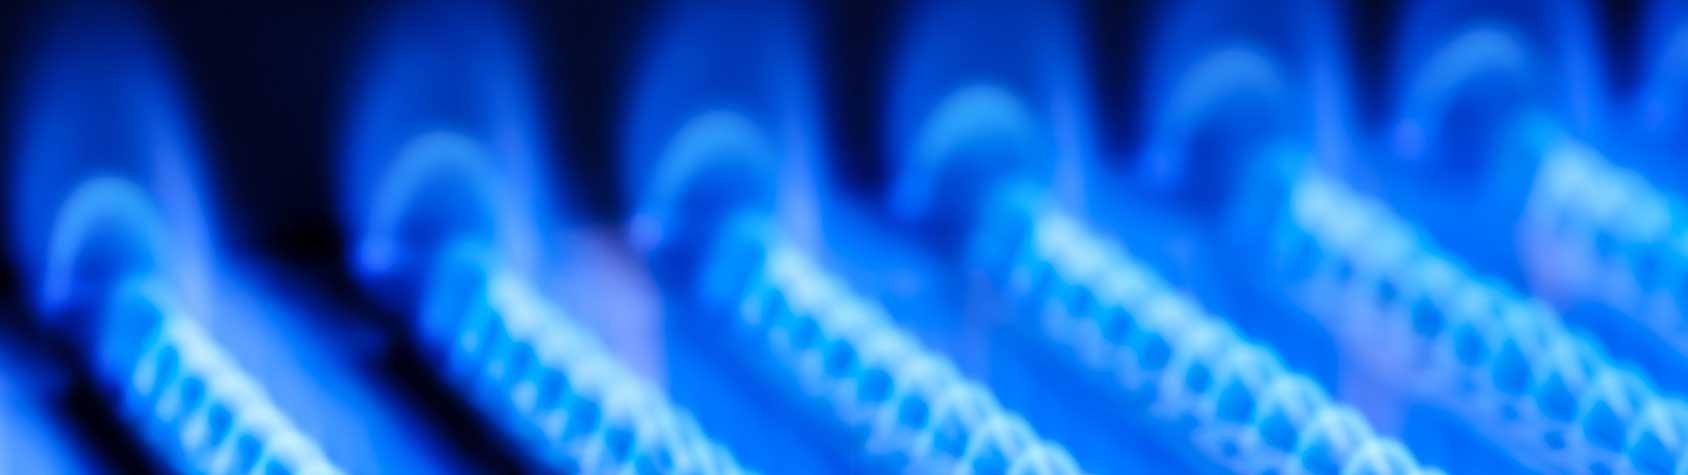 Gasheizung Brennwert